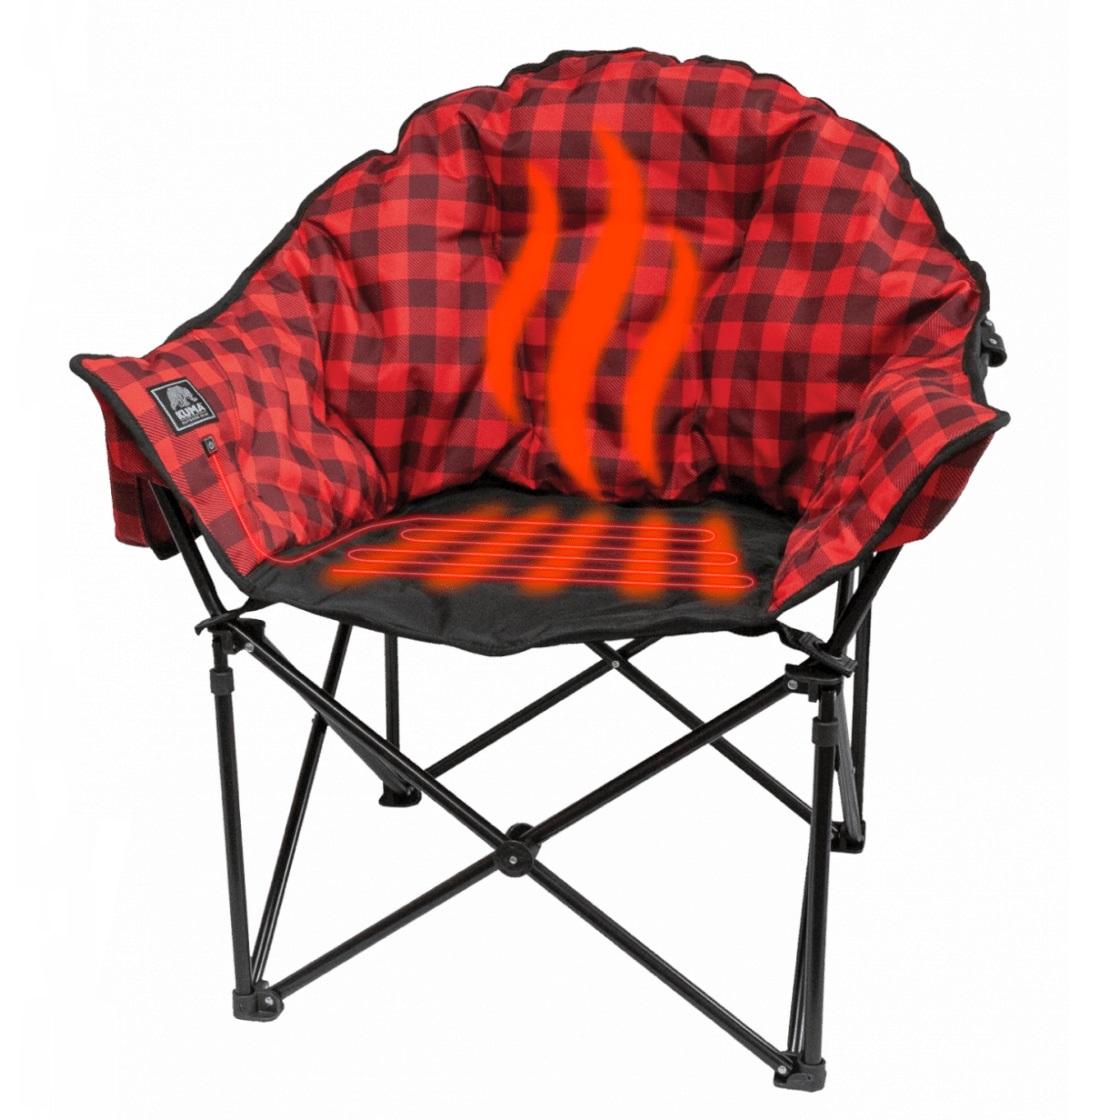 Lazy Bear Heated Chair Red Plaid